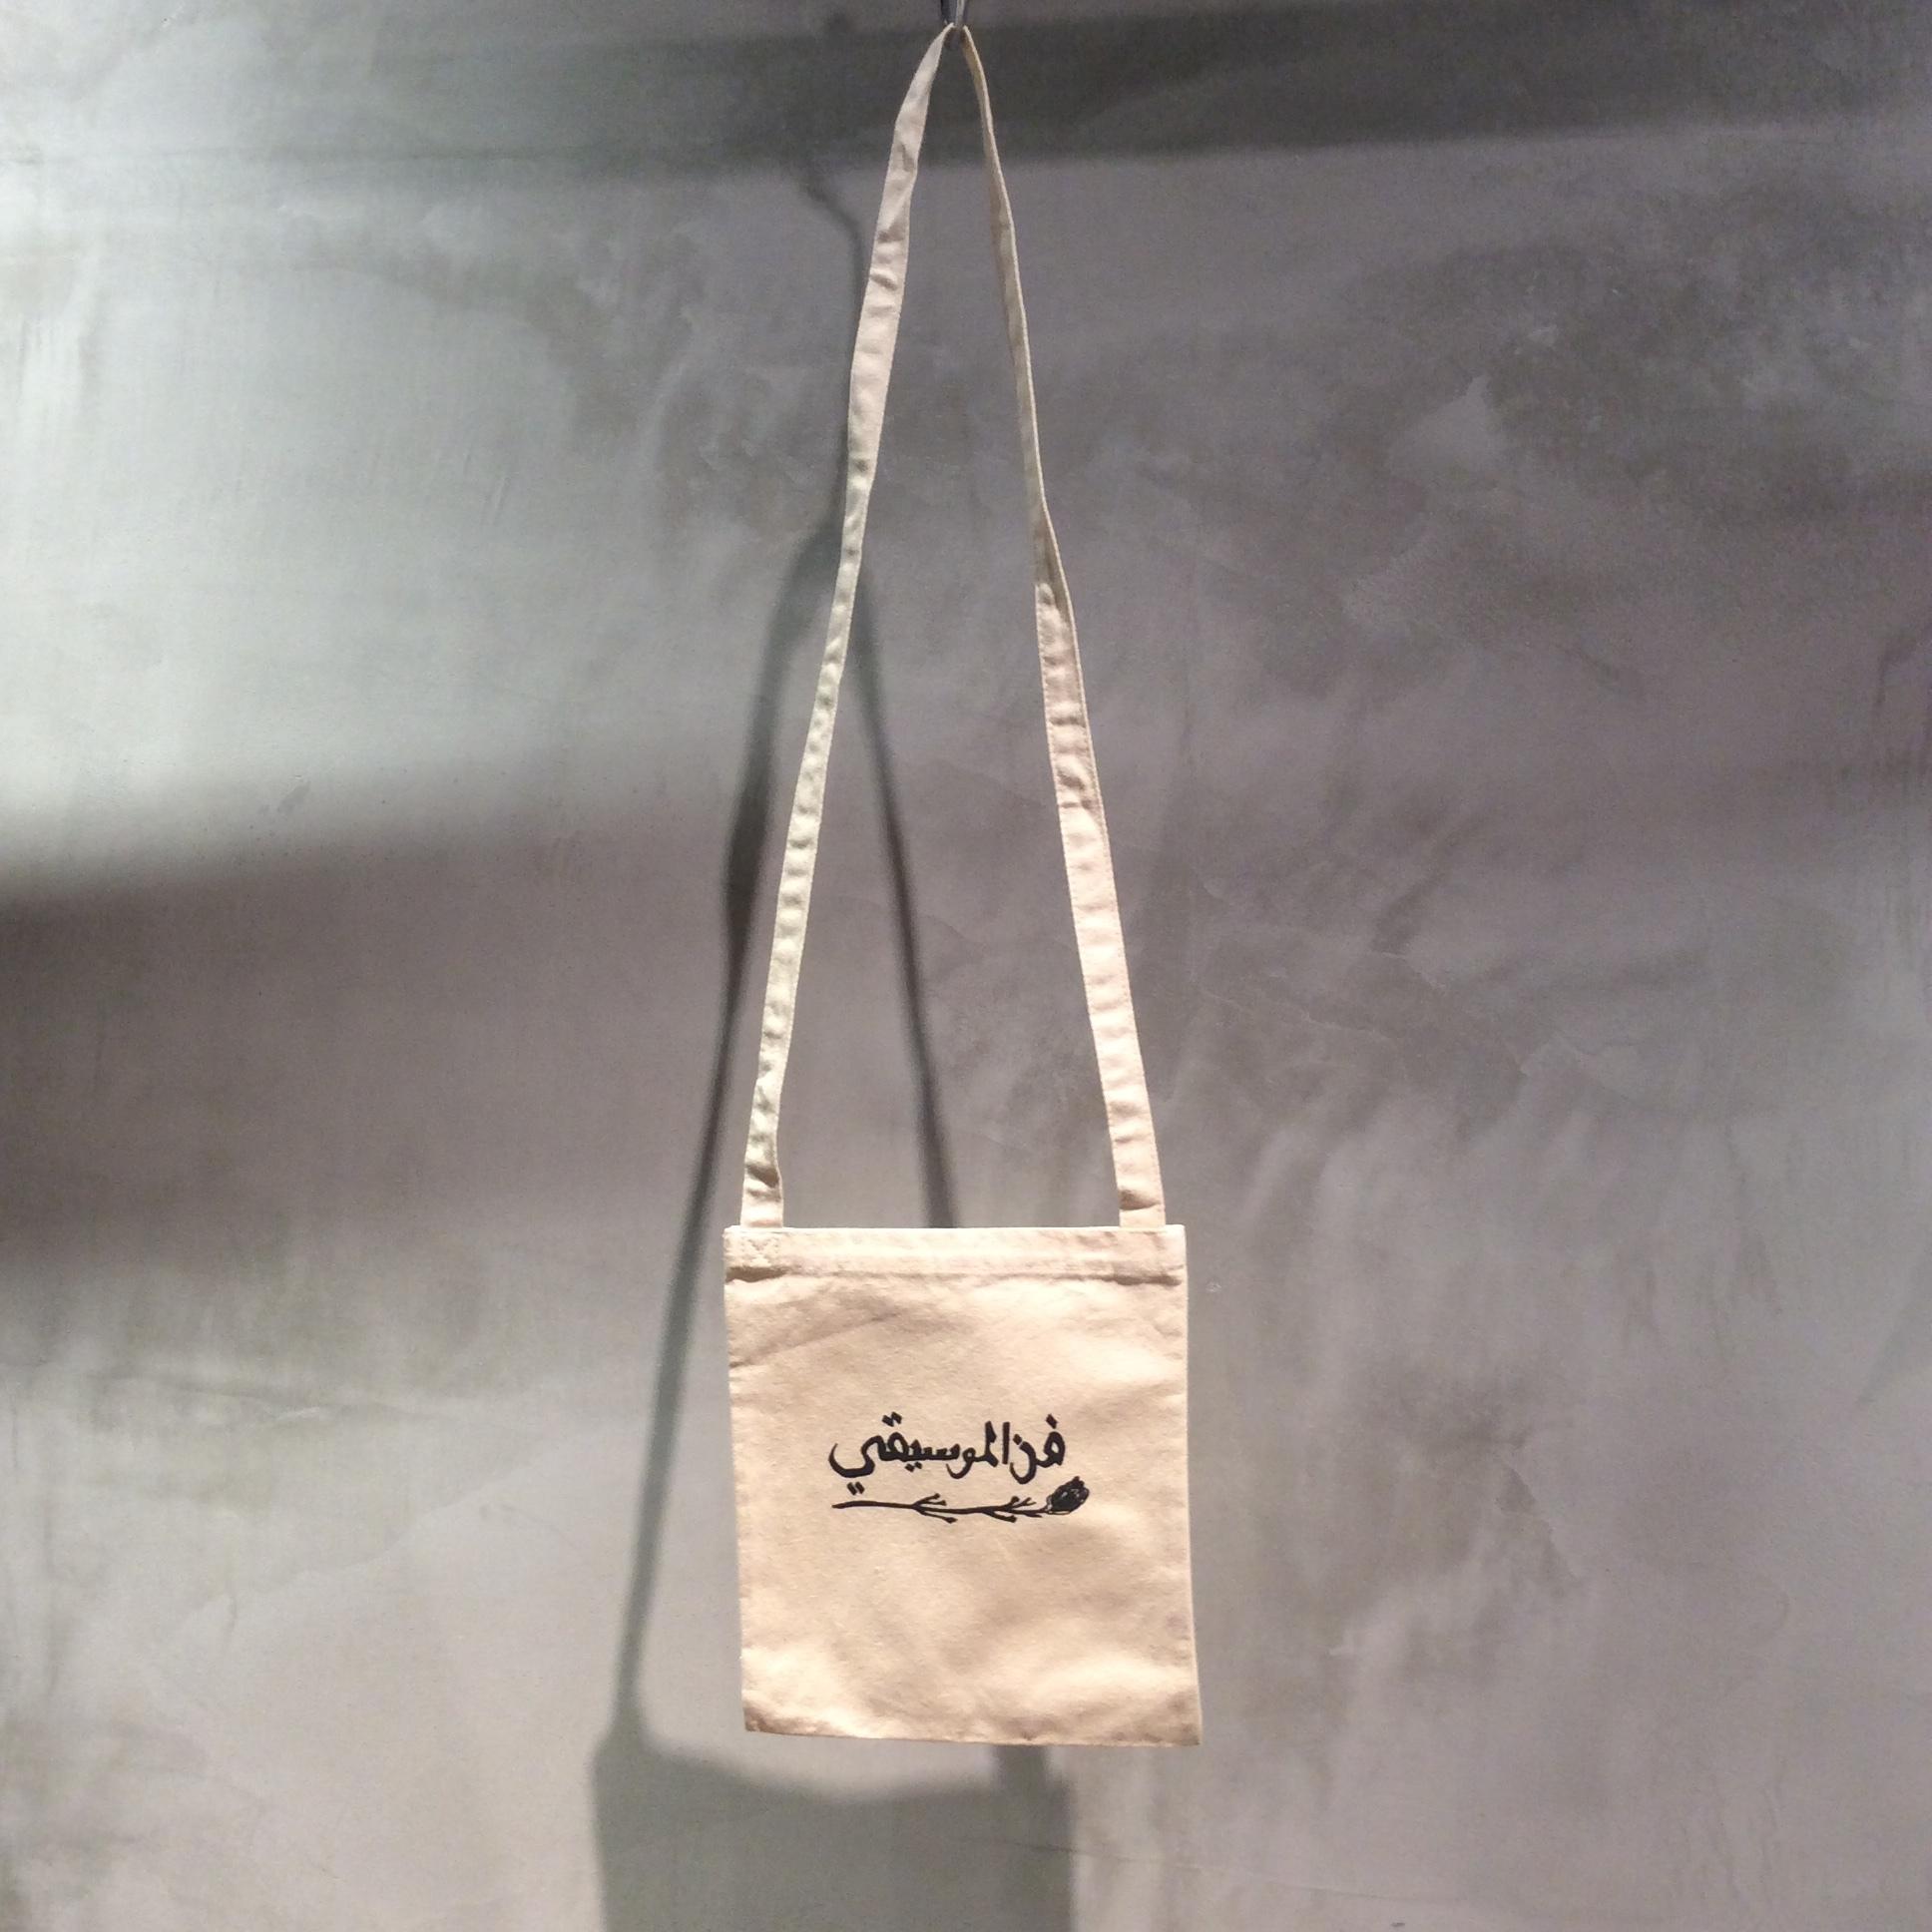 norahi  / ARABIA sacoche bag